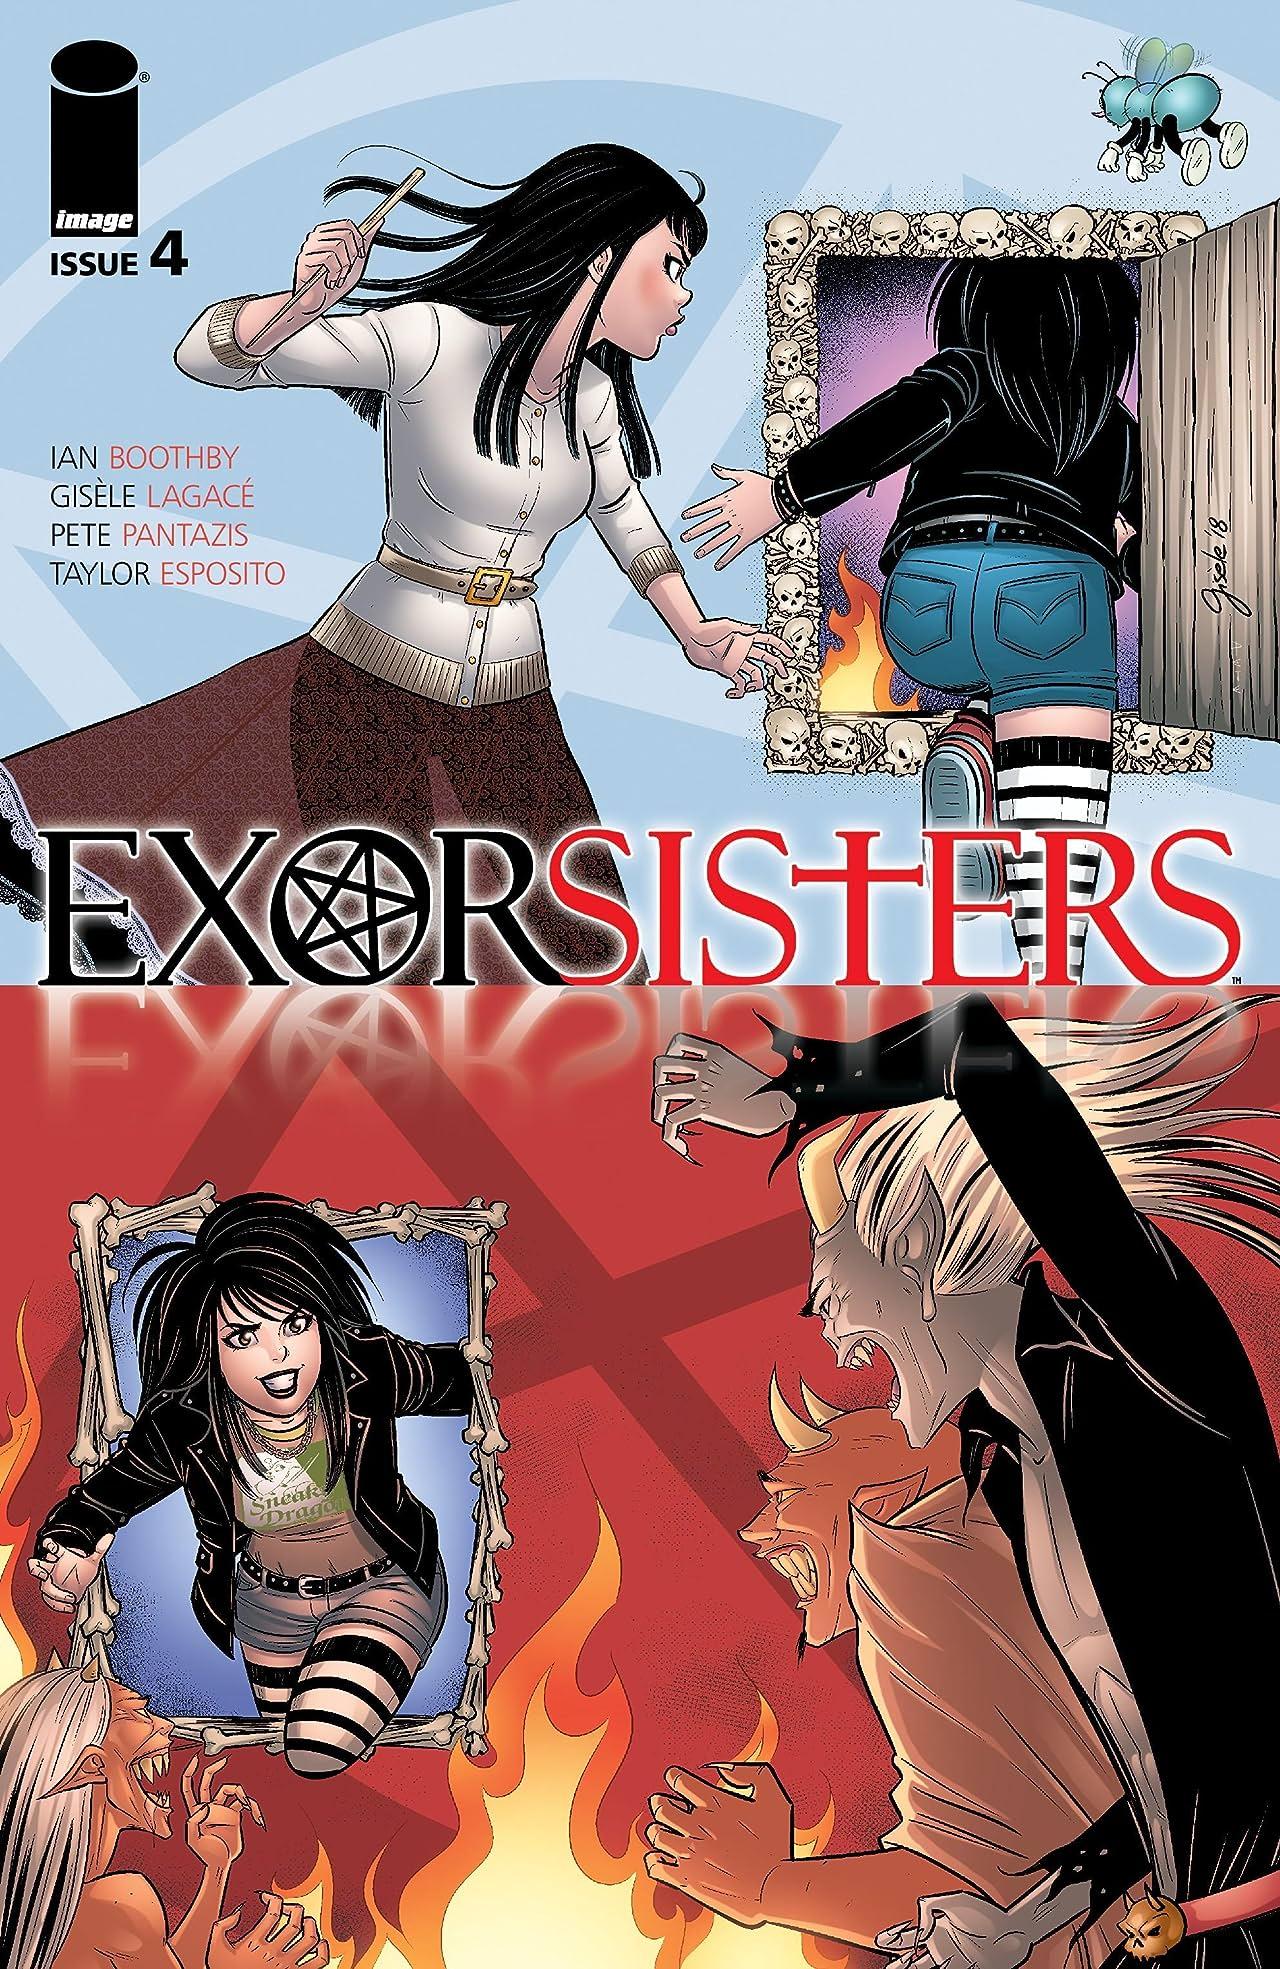 Exorsisters No.4